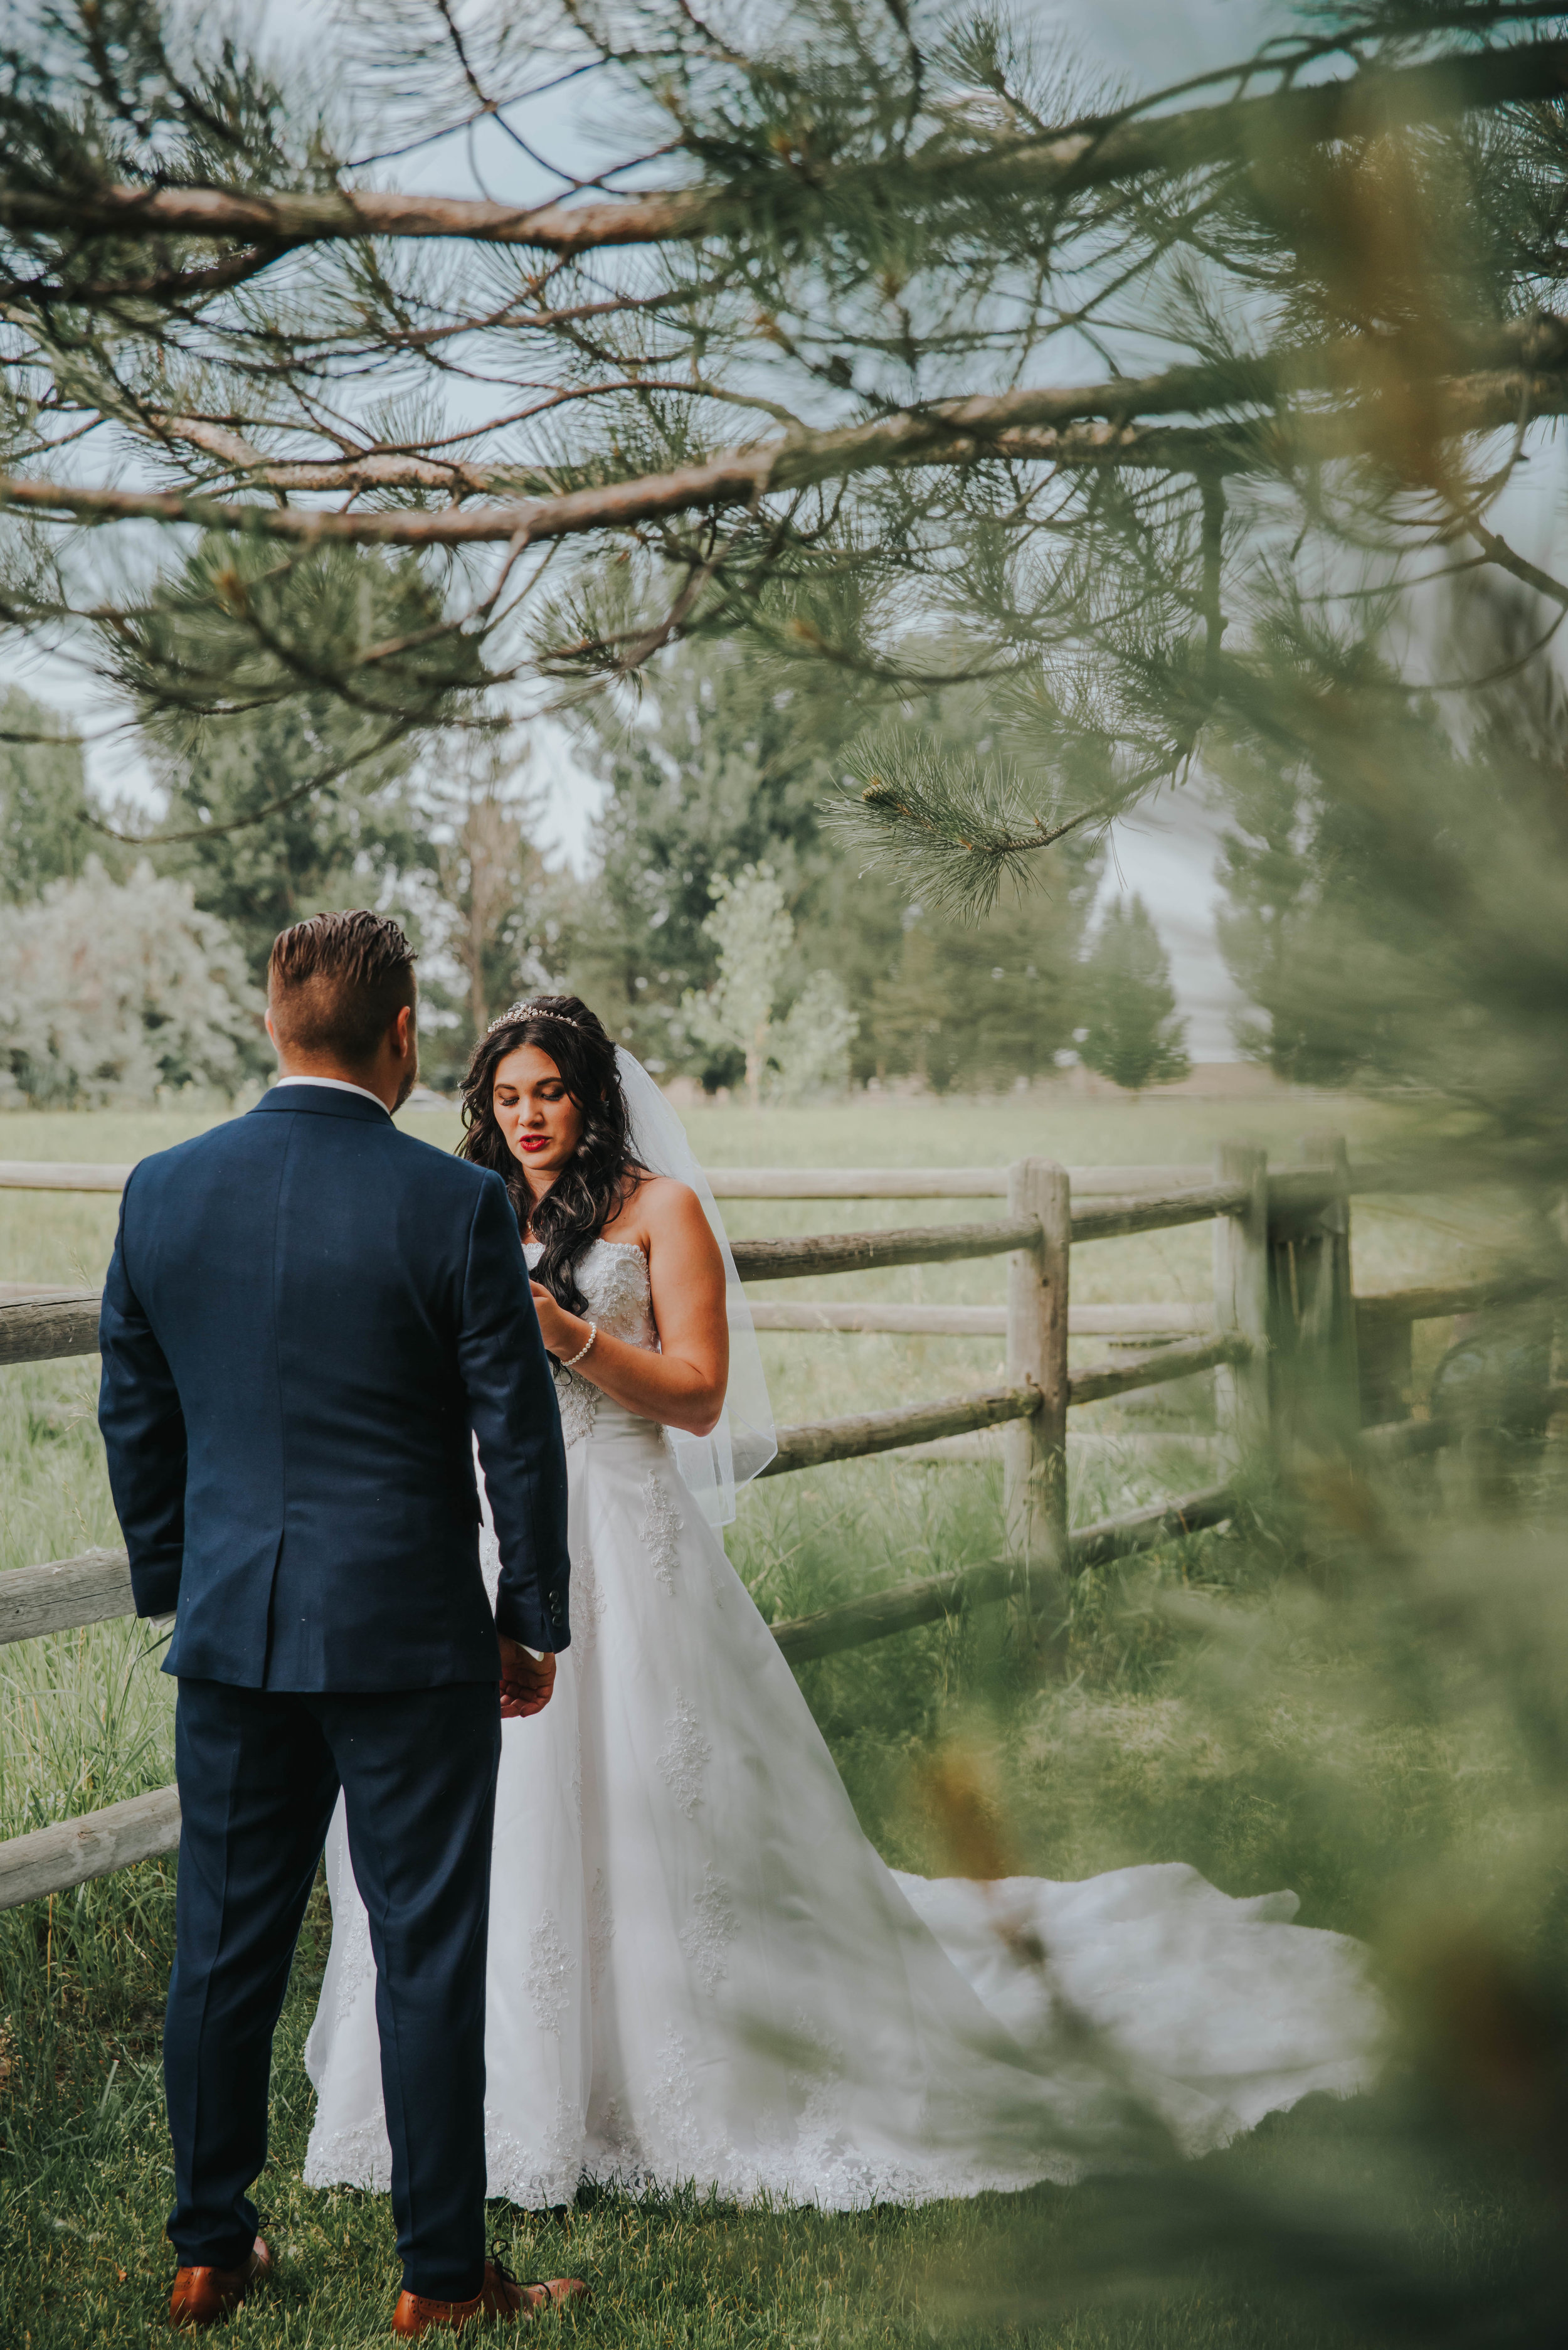 Colorado Wedding Photographer | Miss Miller's Photography